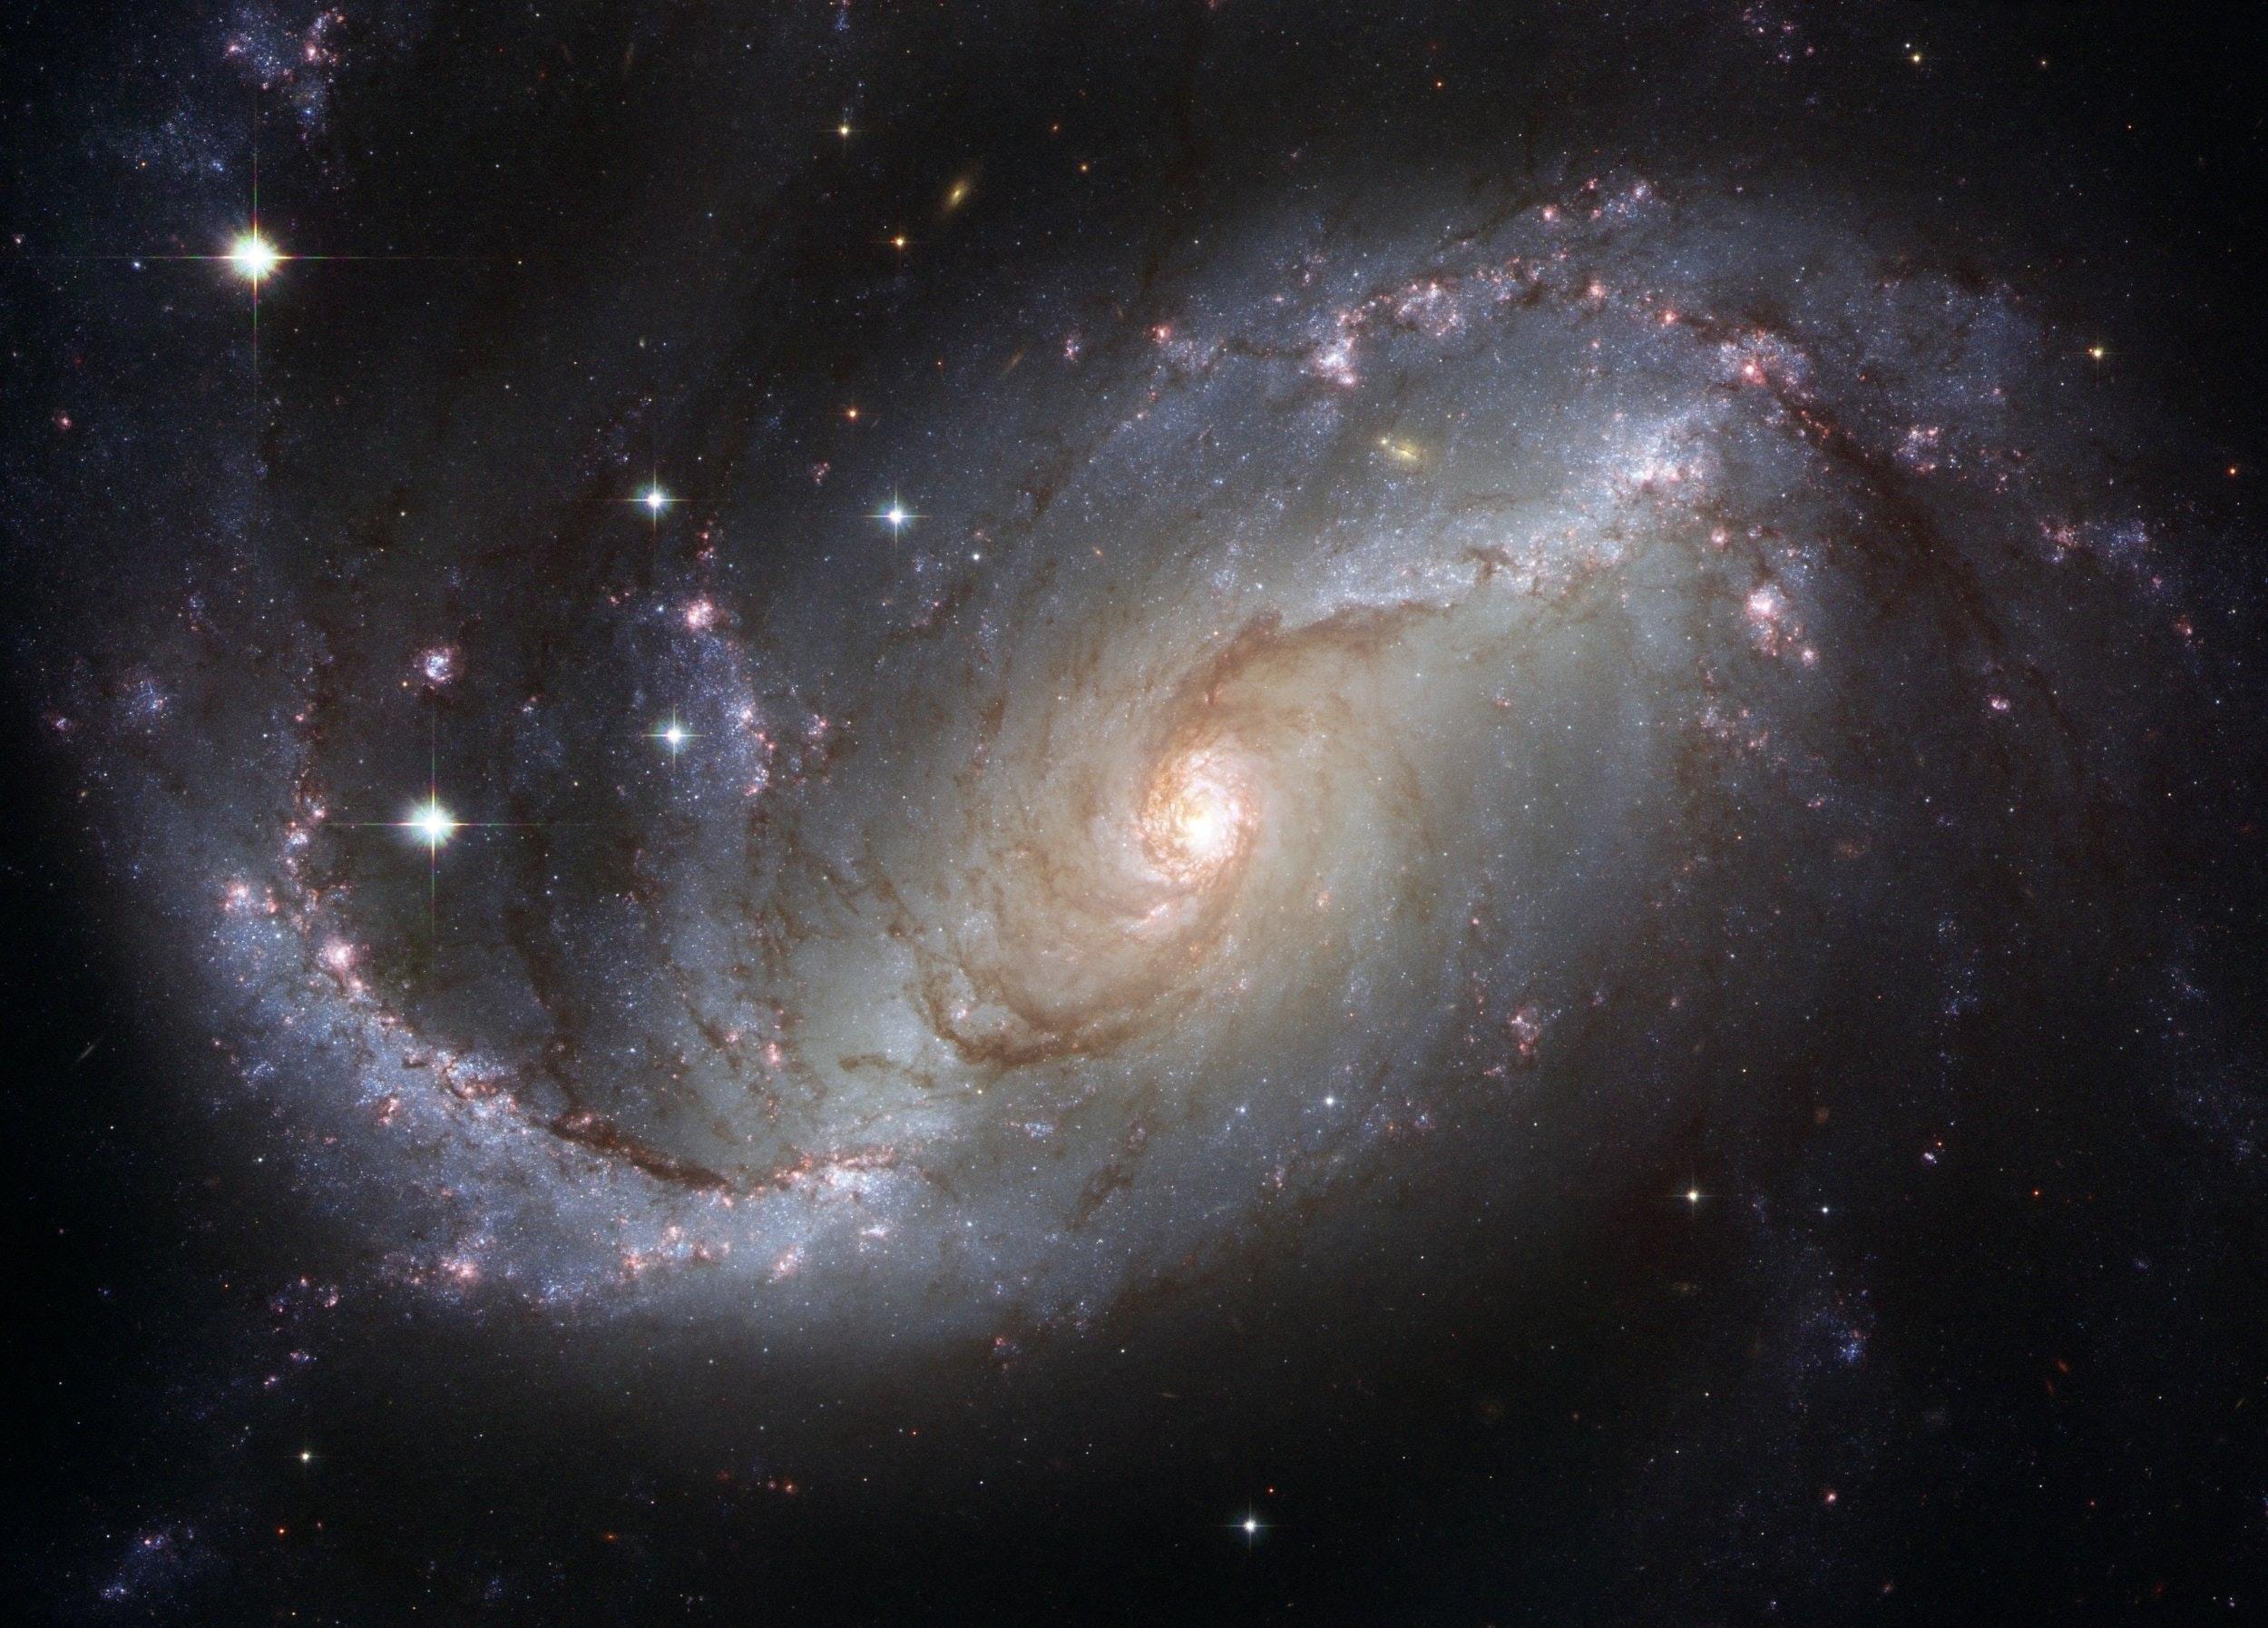 Gray And Black Galaxy Wallpaper Free Stock Photo